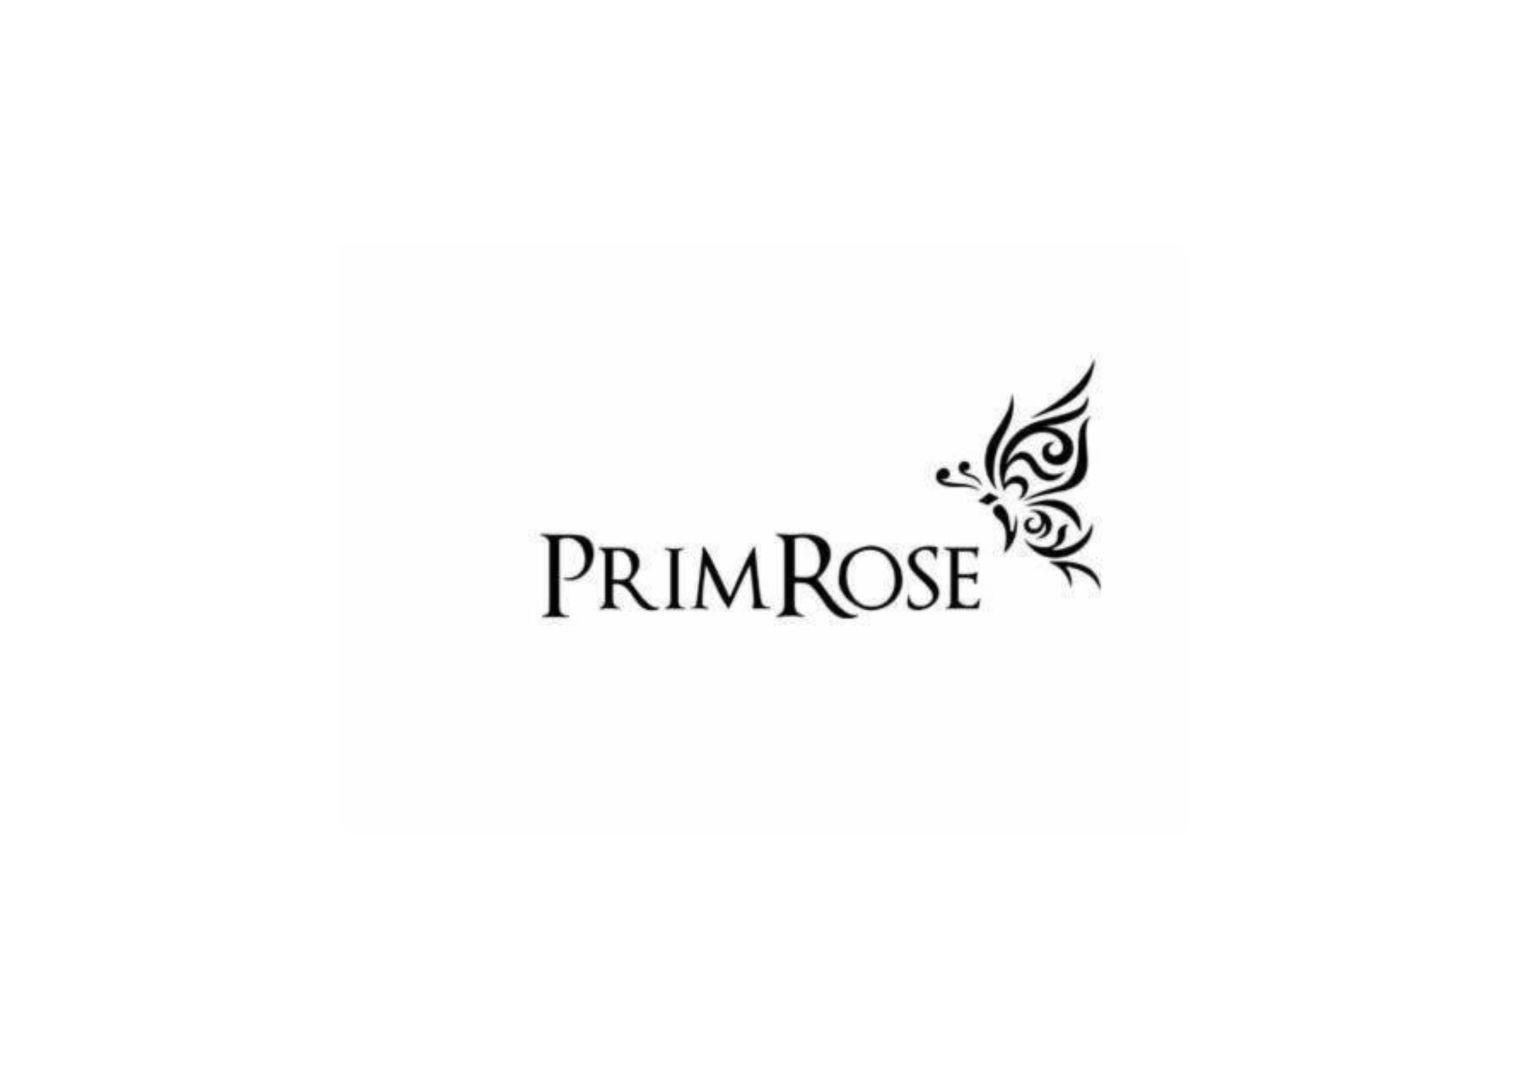 PrimRose スタッフ募集!イオンモール下妻店 / TRFT11003のカバー写真